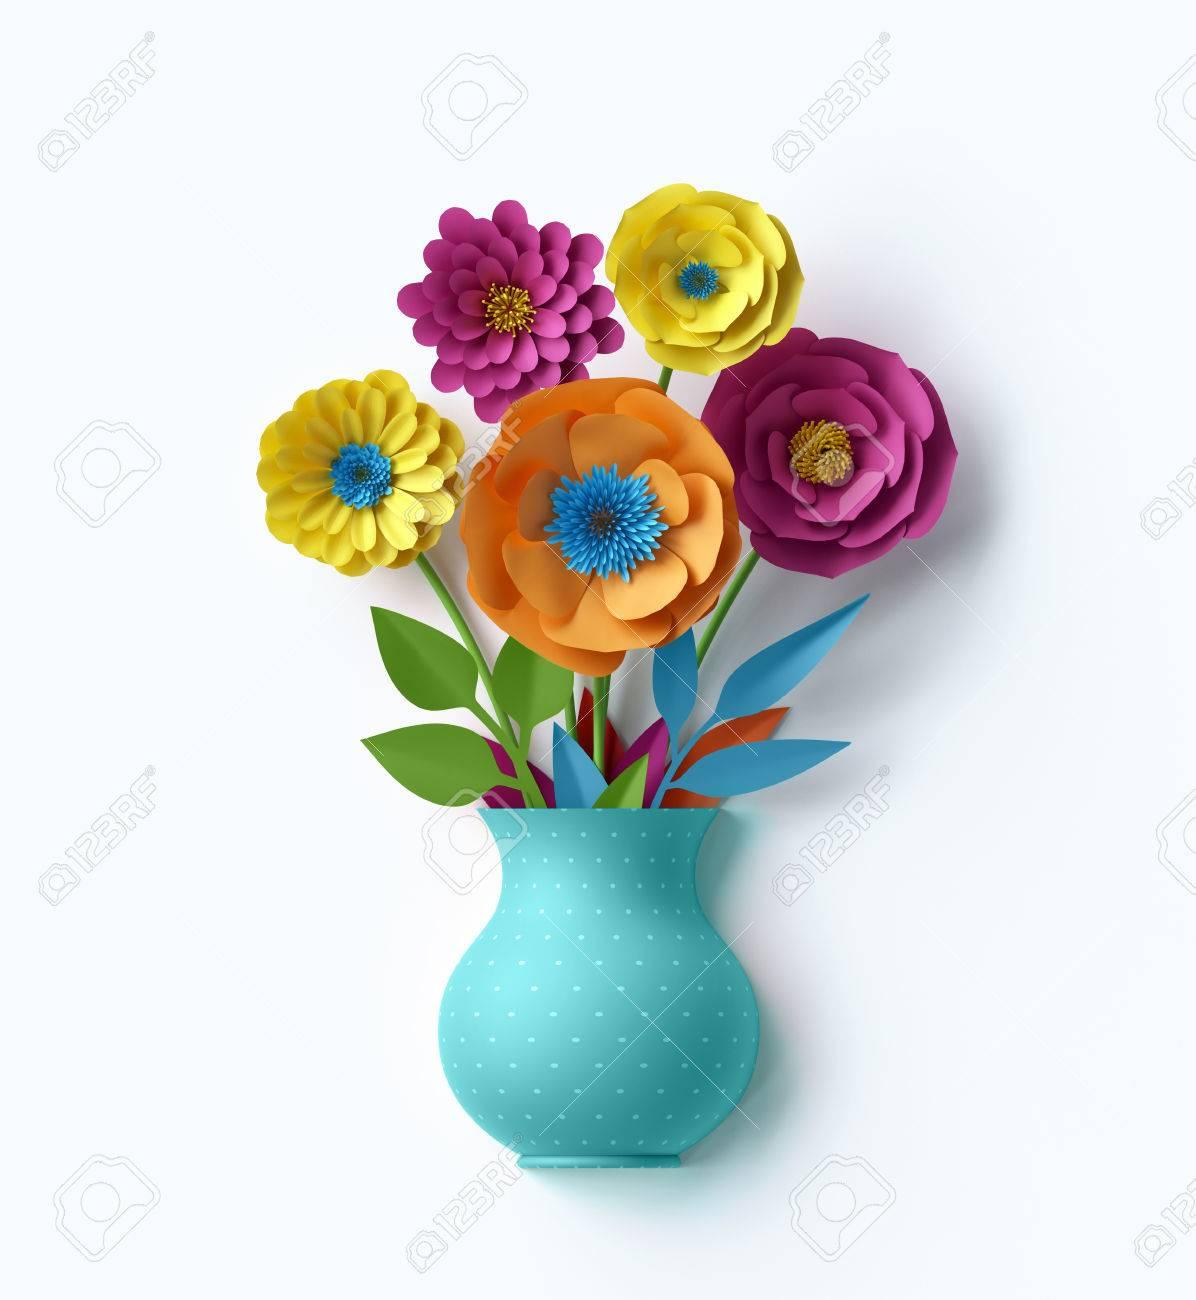 3d Render Digital Illustration Cute Vase With Colorful Paper